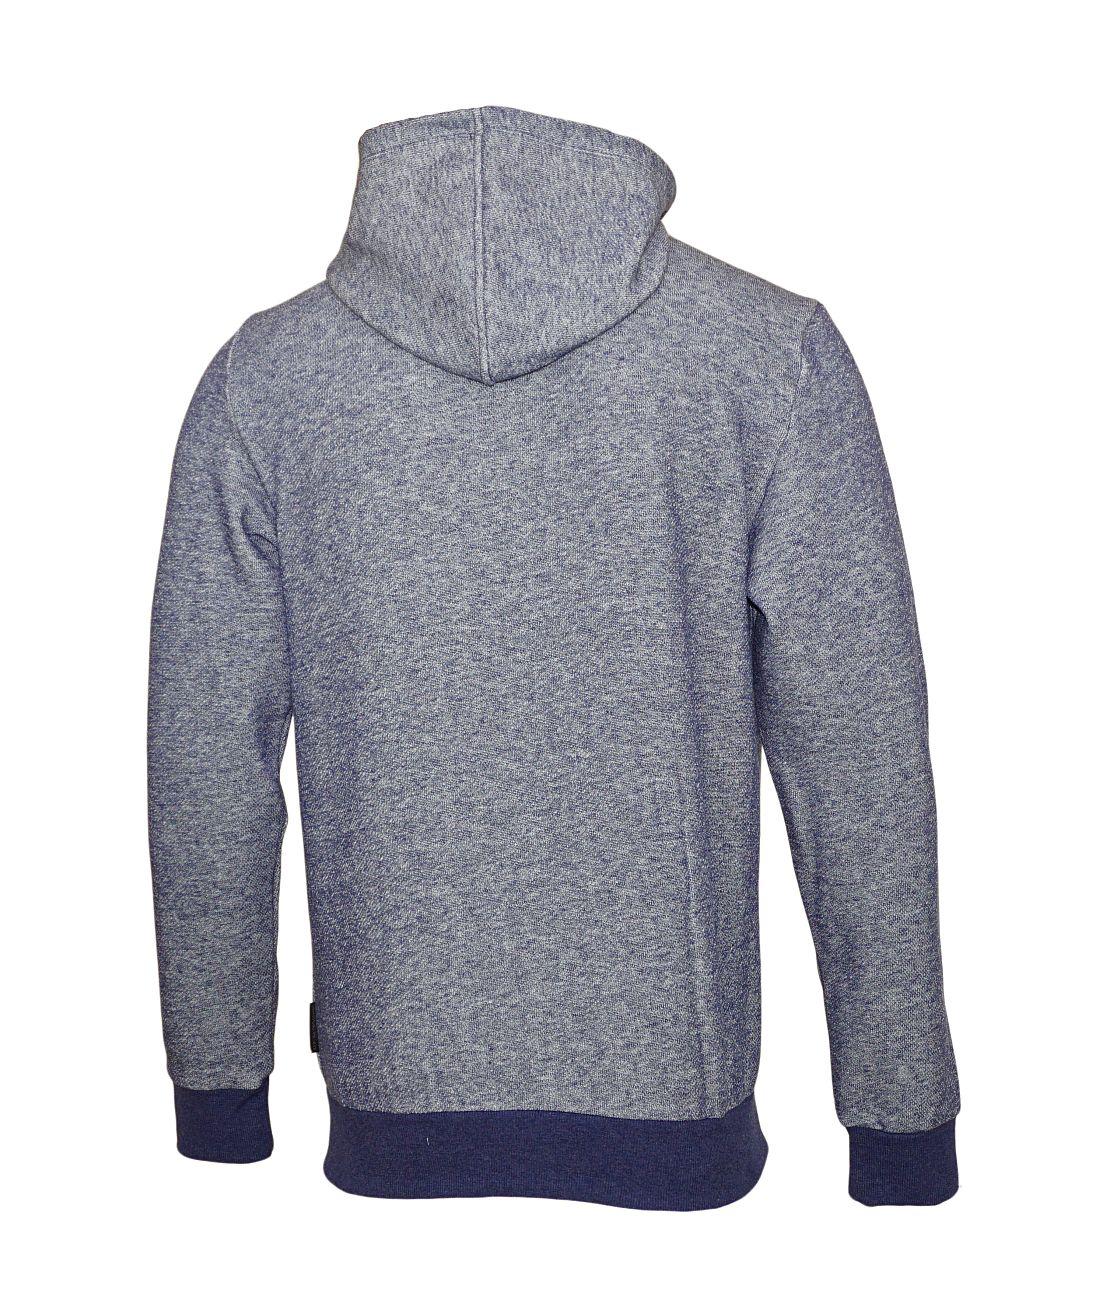 Emporio Armani Sweater Hooded m. Reißverschluss 111666 8A575 52635 BLU MELANGE SH18-EAS1